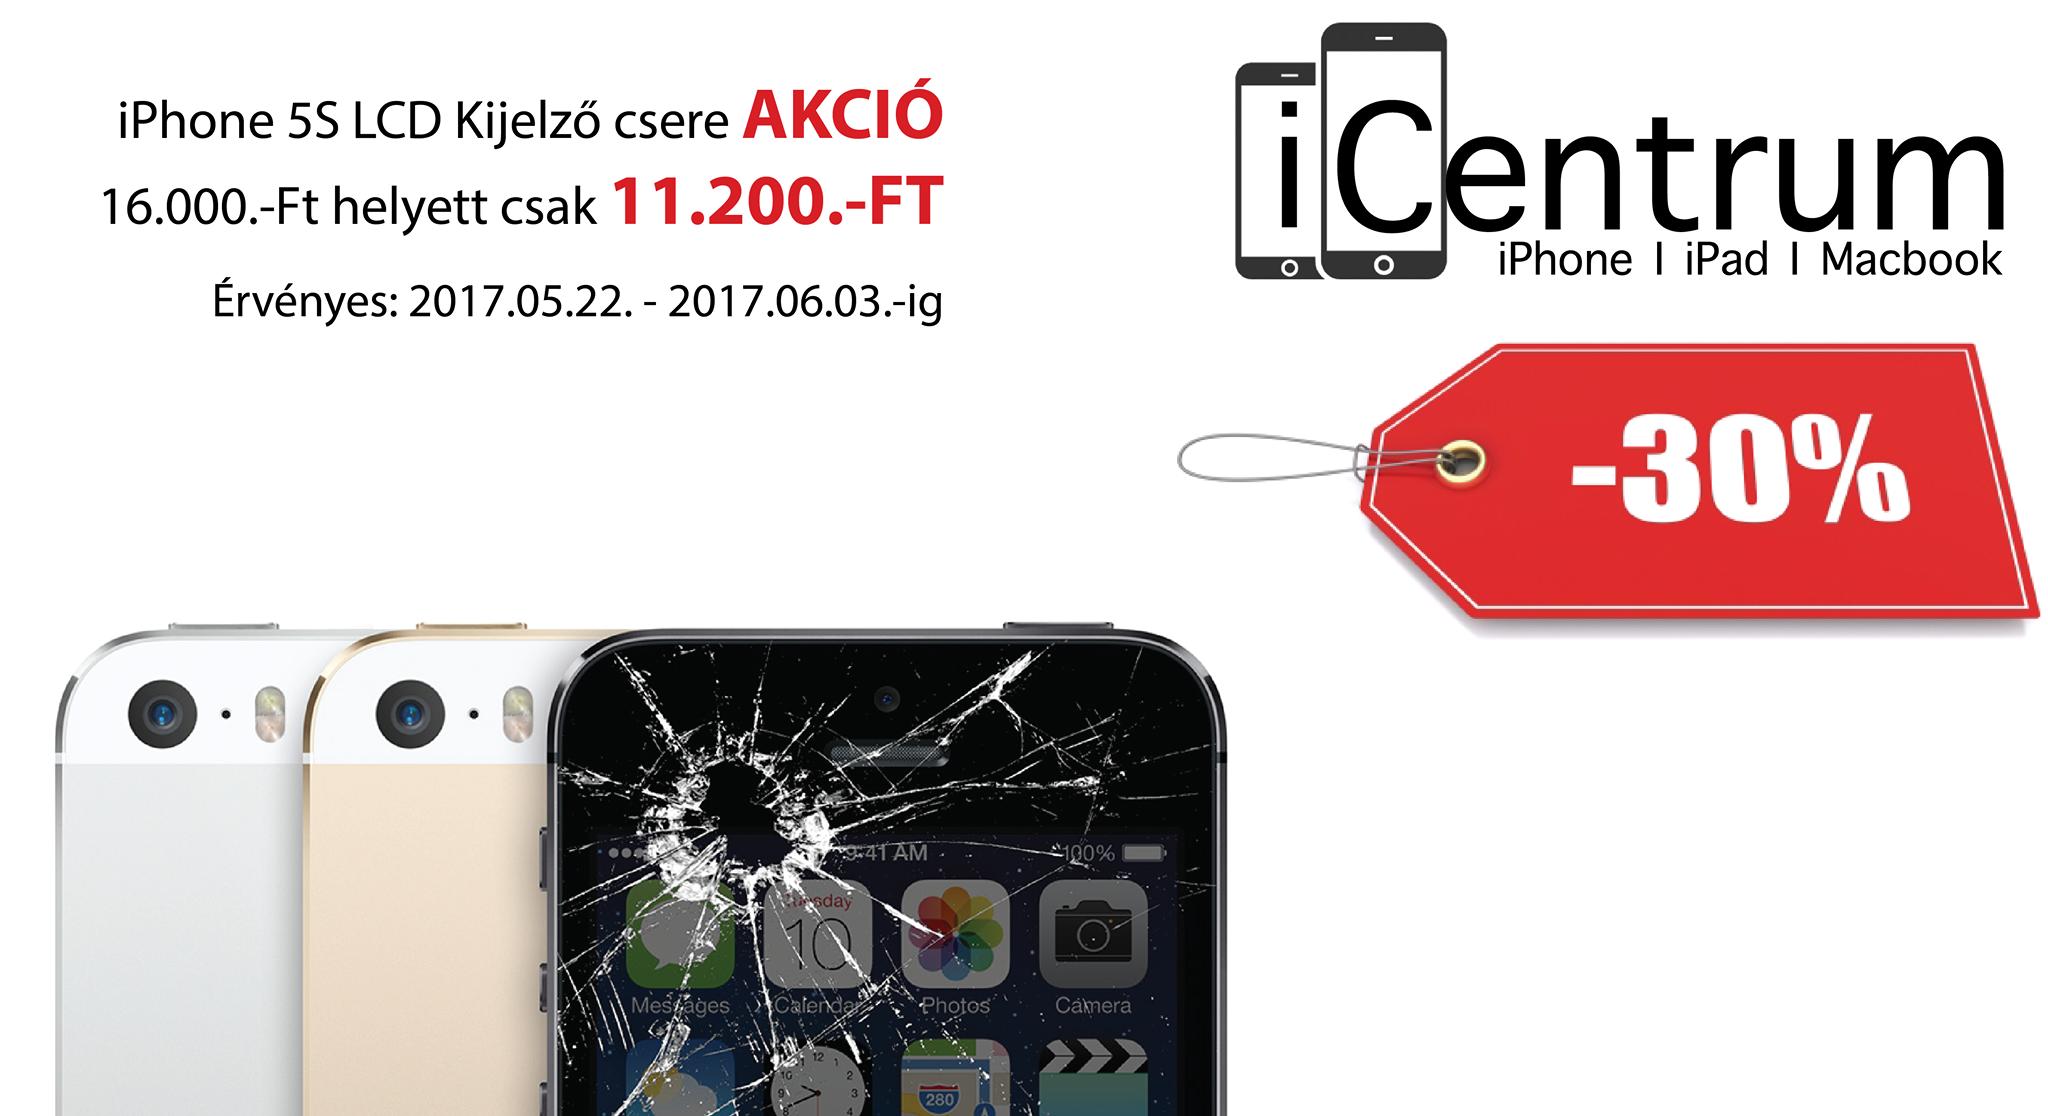 iCentrum iPhone 5S kijelző csere akció